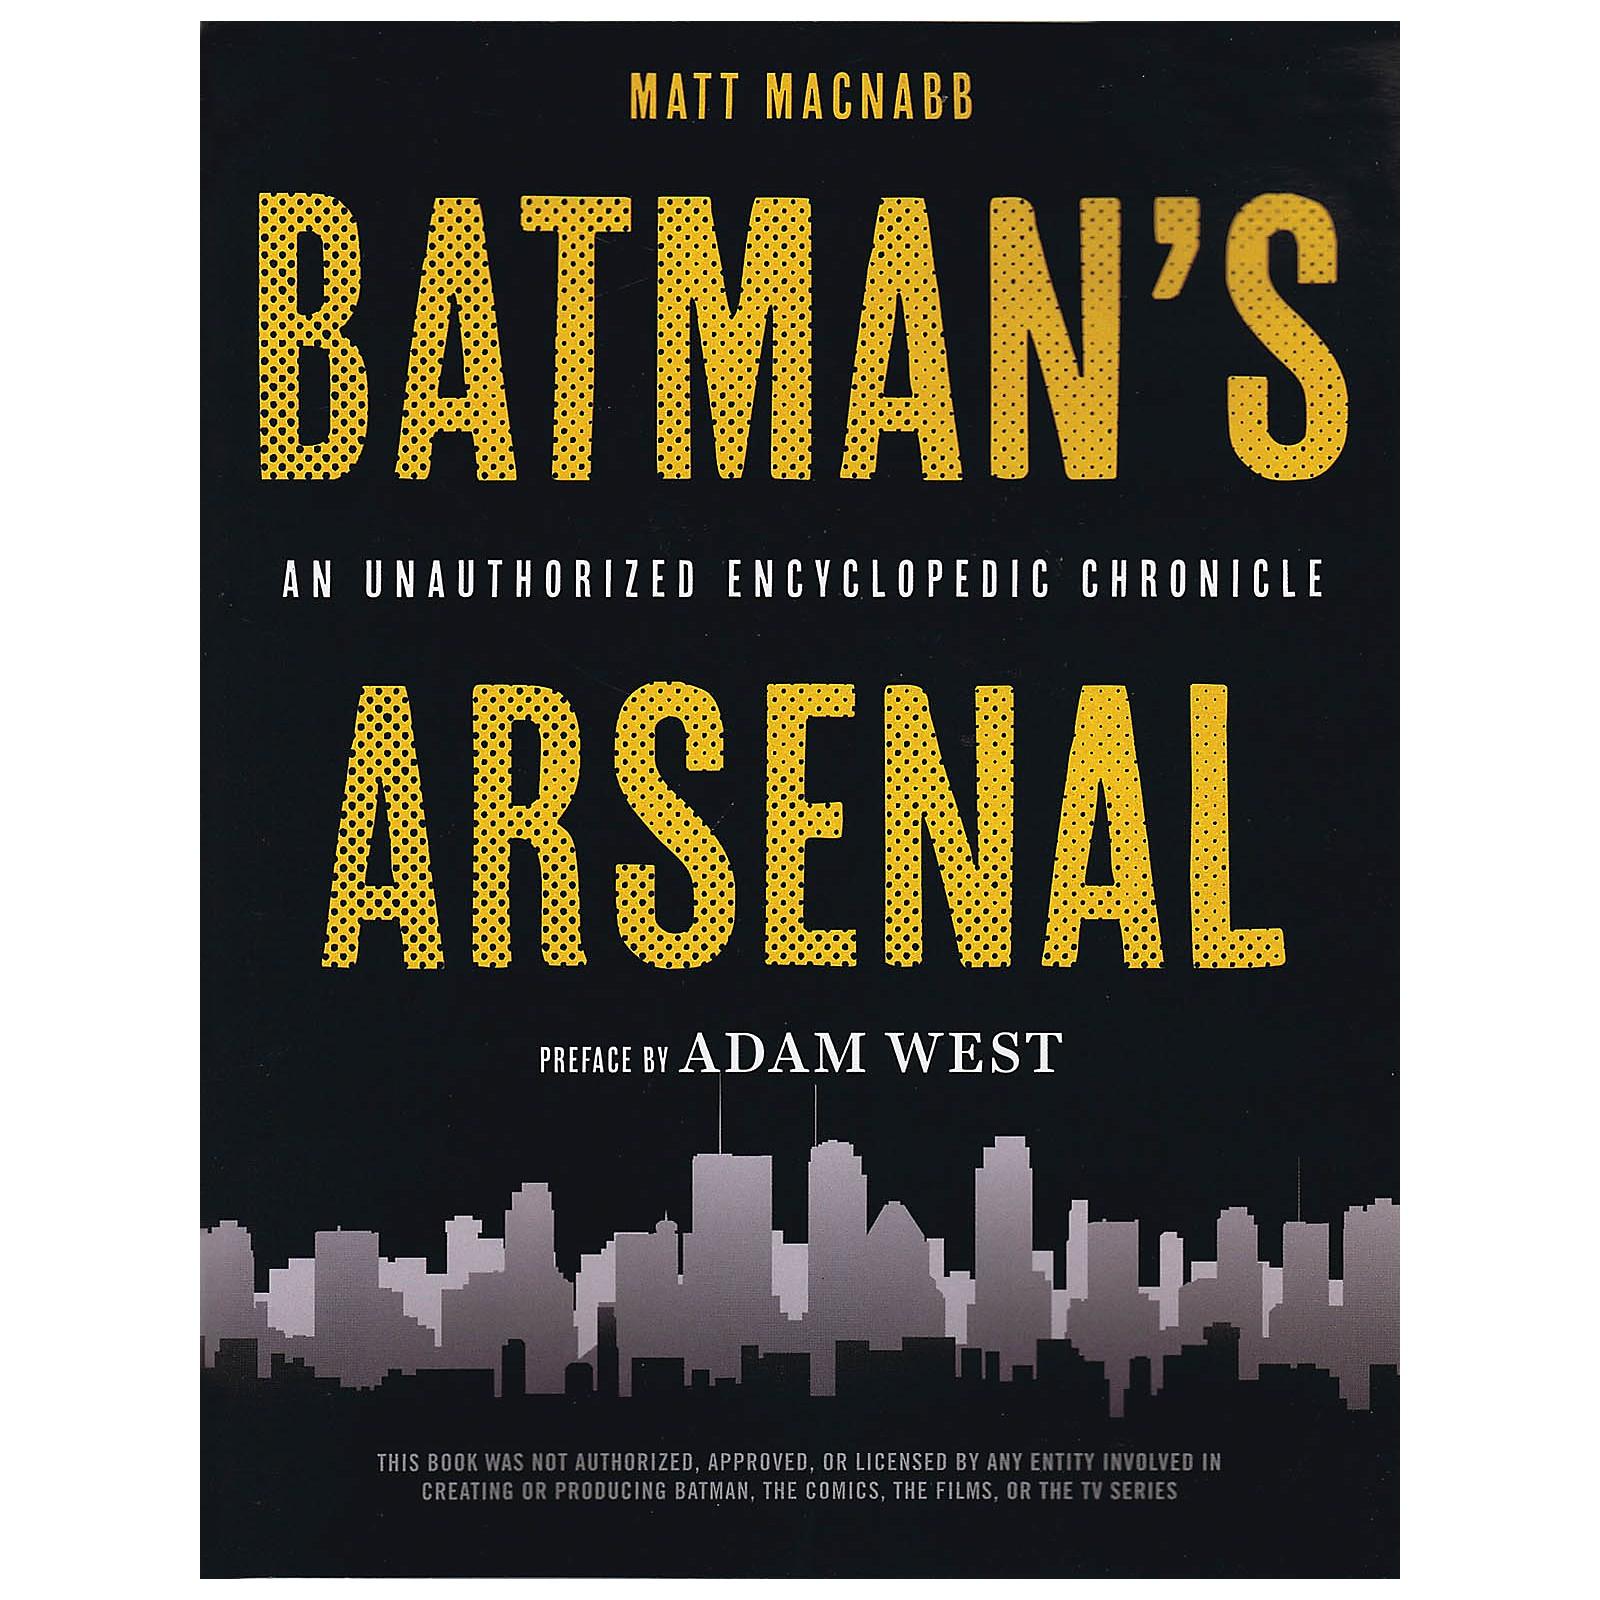 Opus Batman's Arsenal (An Unauthorized Encyclopedic Chronicle) Book Series Softcover Written by Matt MacNabb